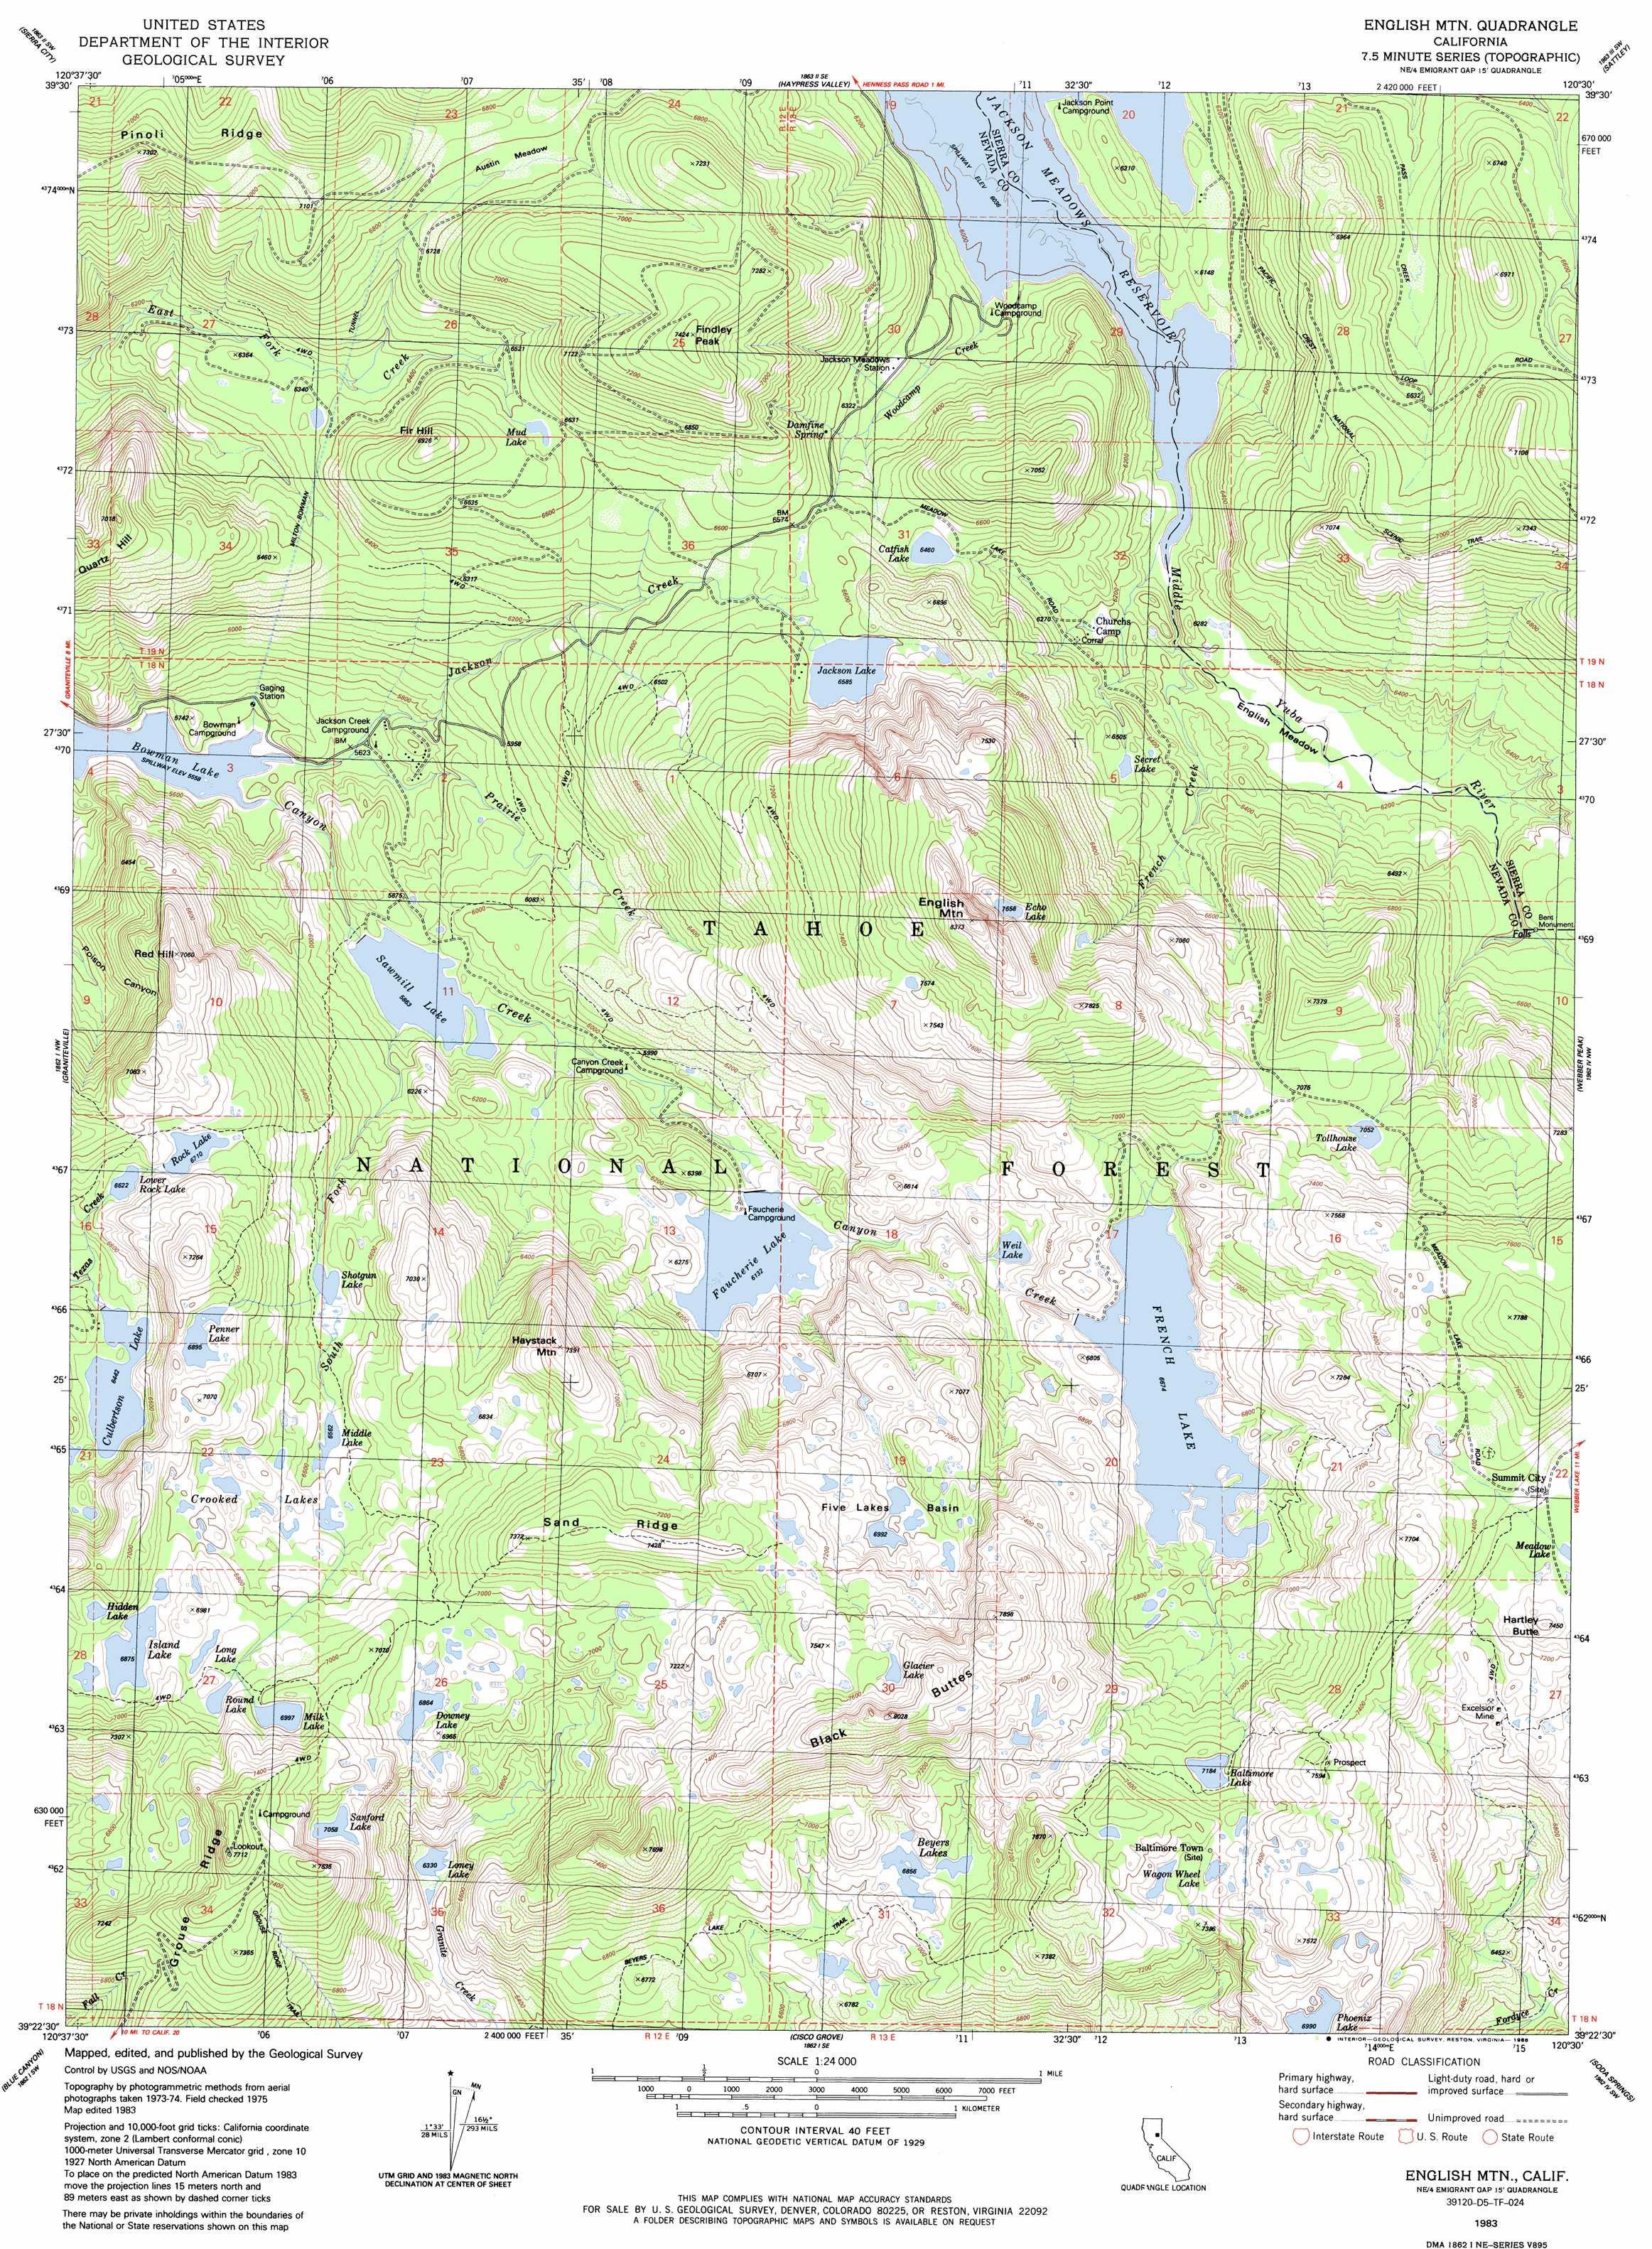 Physical Map Of California With Mountains Free Printable English - Usgs Topo Maps California